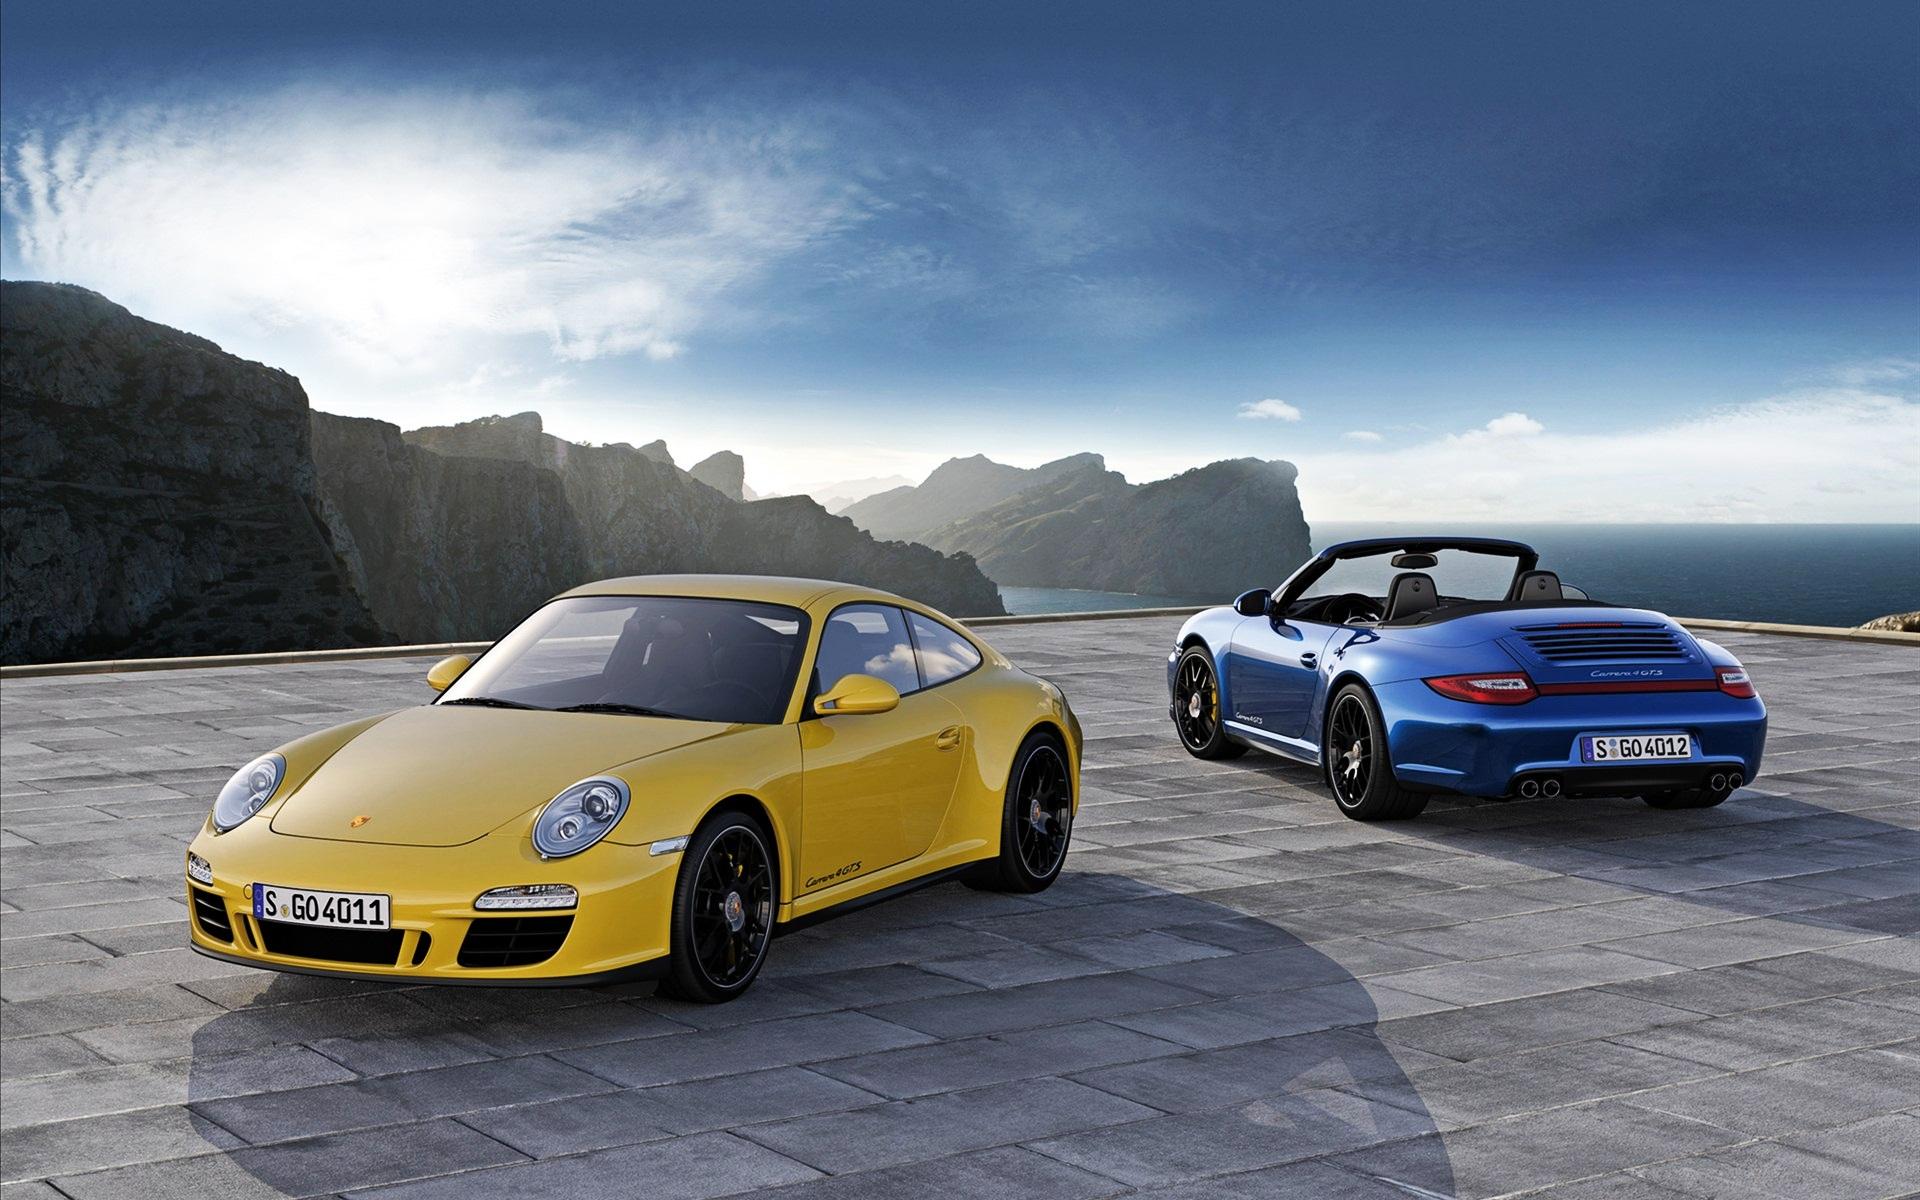 2012 Porsche 911 Carrera 4 GTS Wallpapers HD Wallpapers 1920x1200